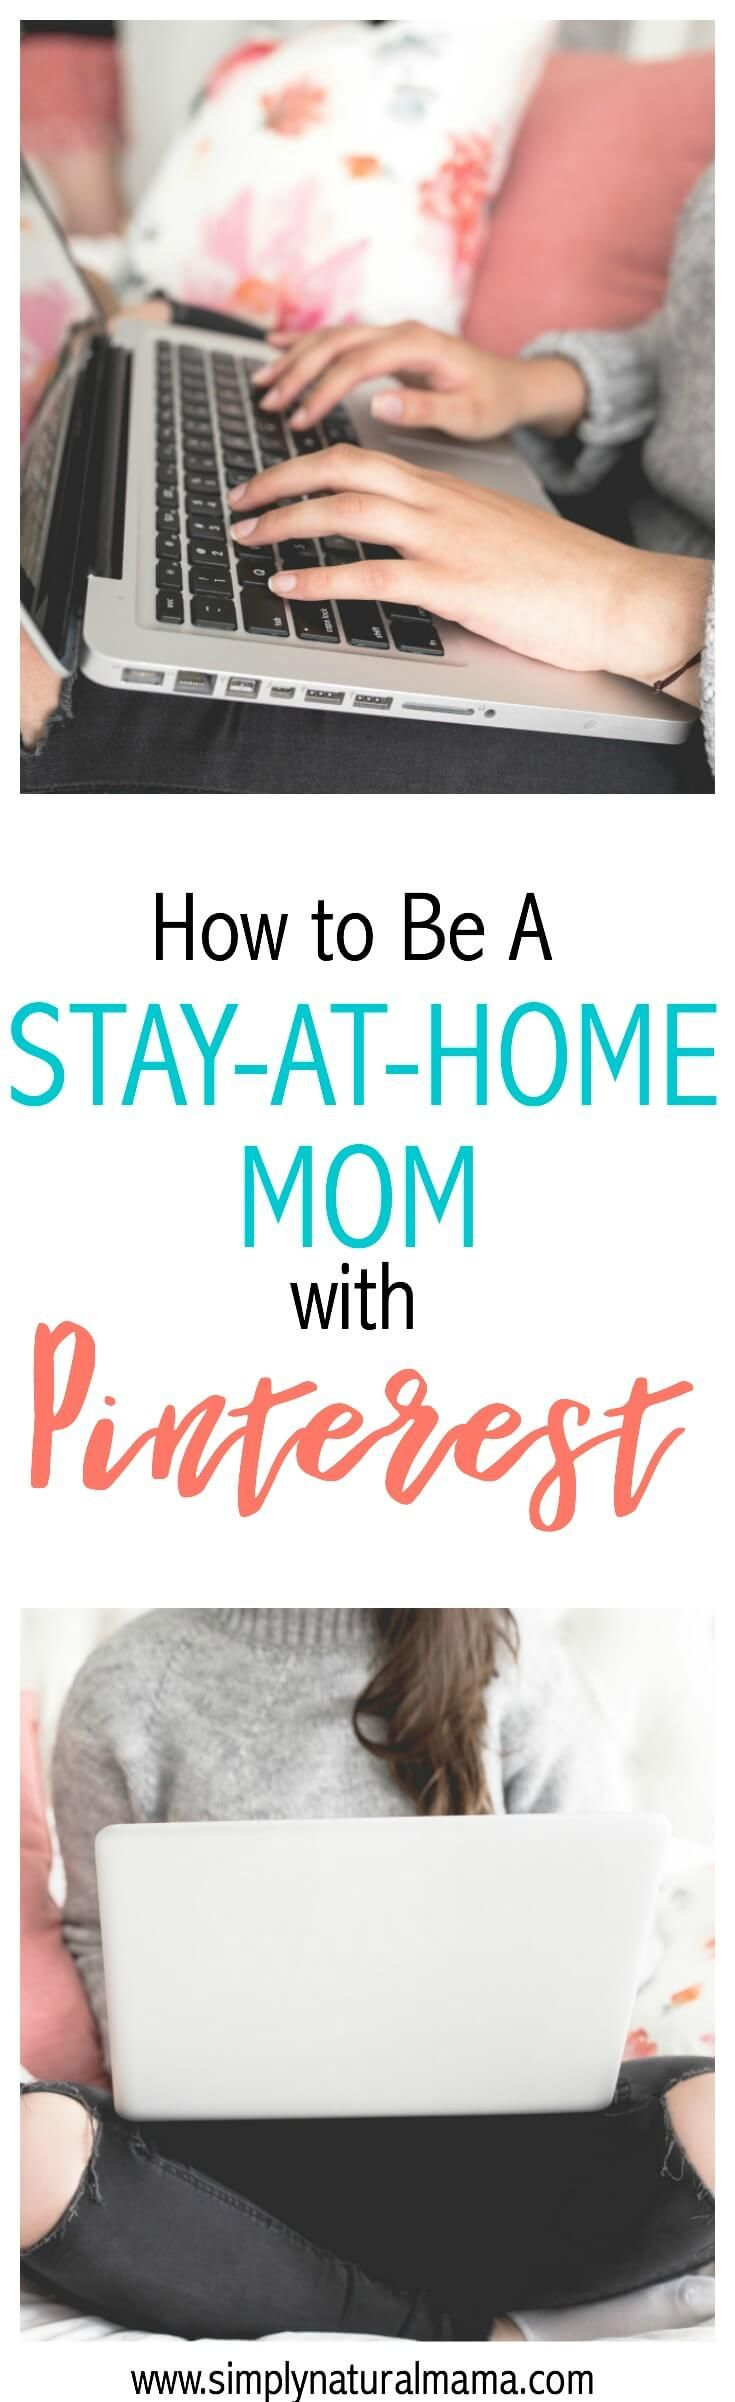 22 best Mompreneur Ideas images on Pinterest | Life hacks, Life tips ...